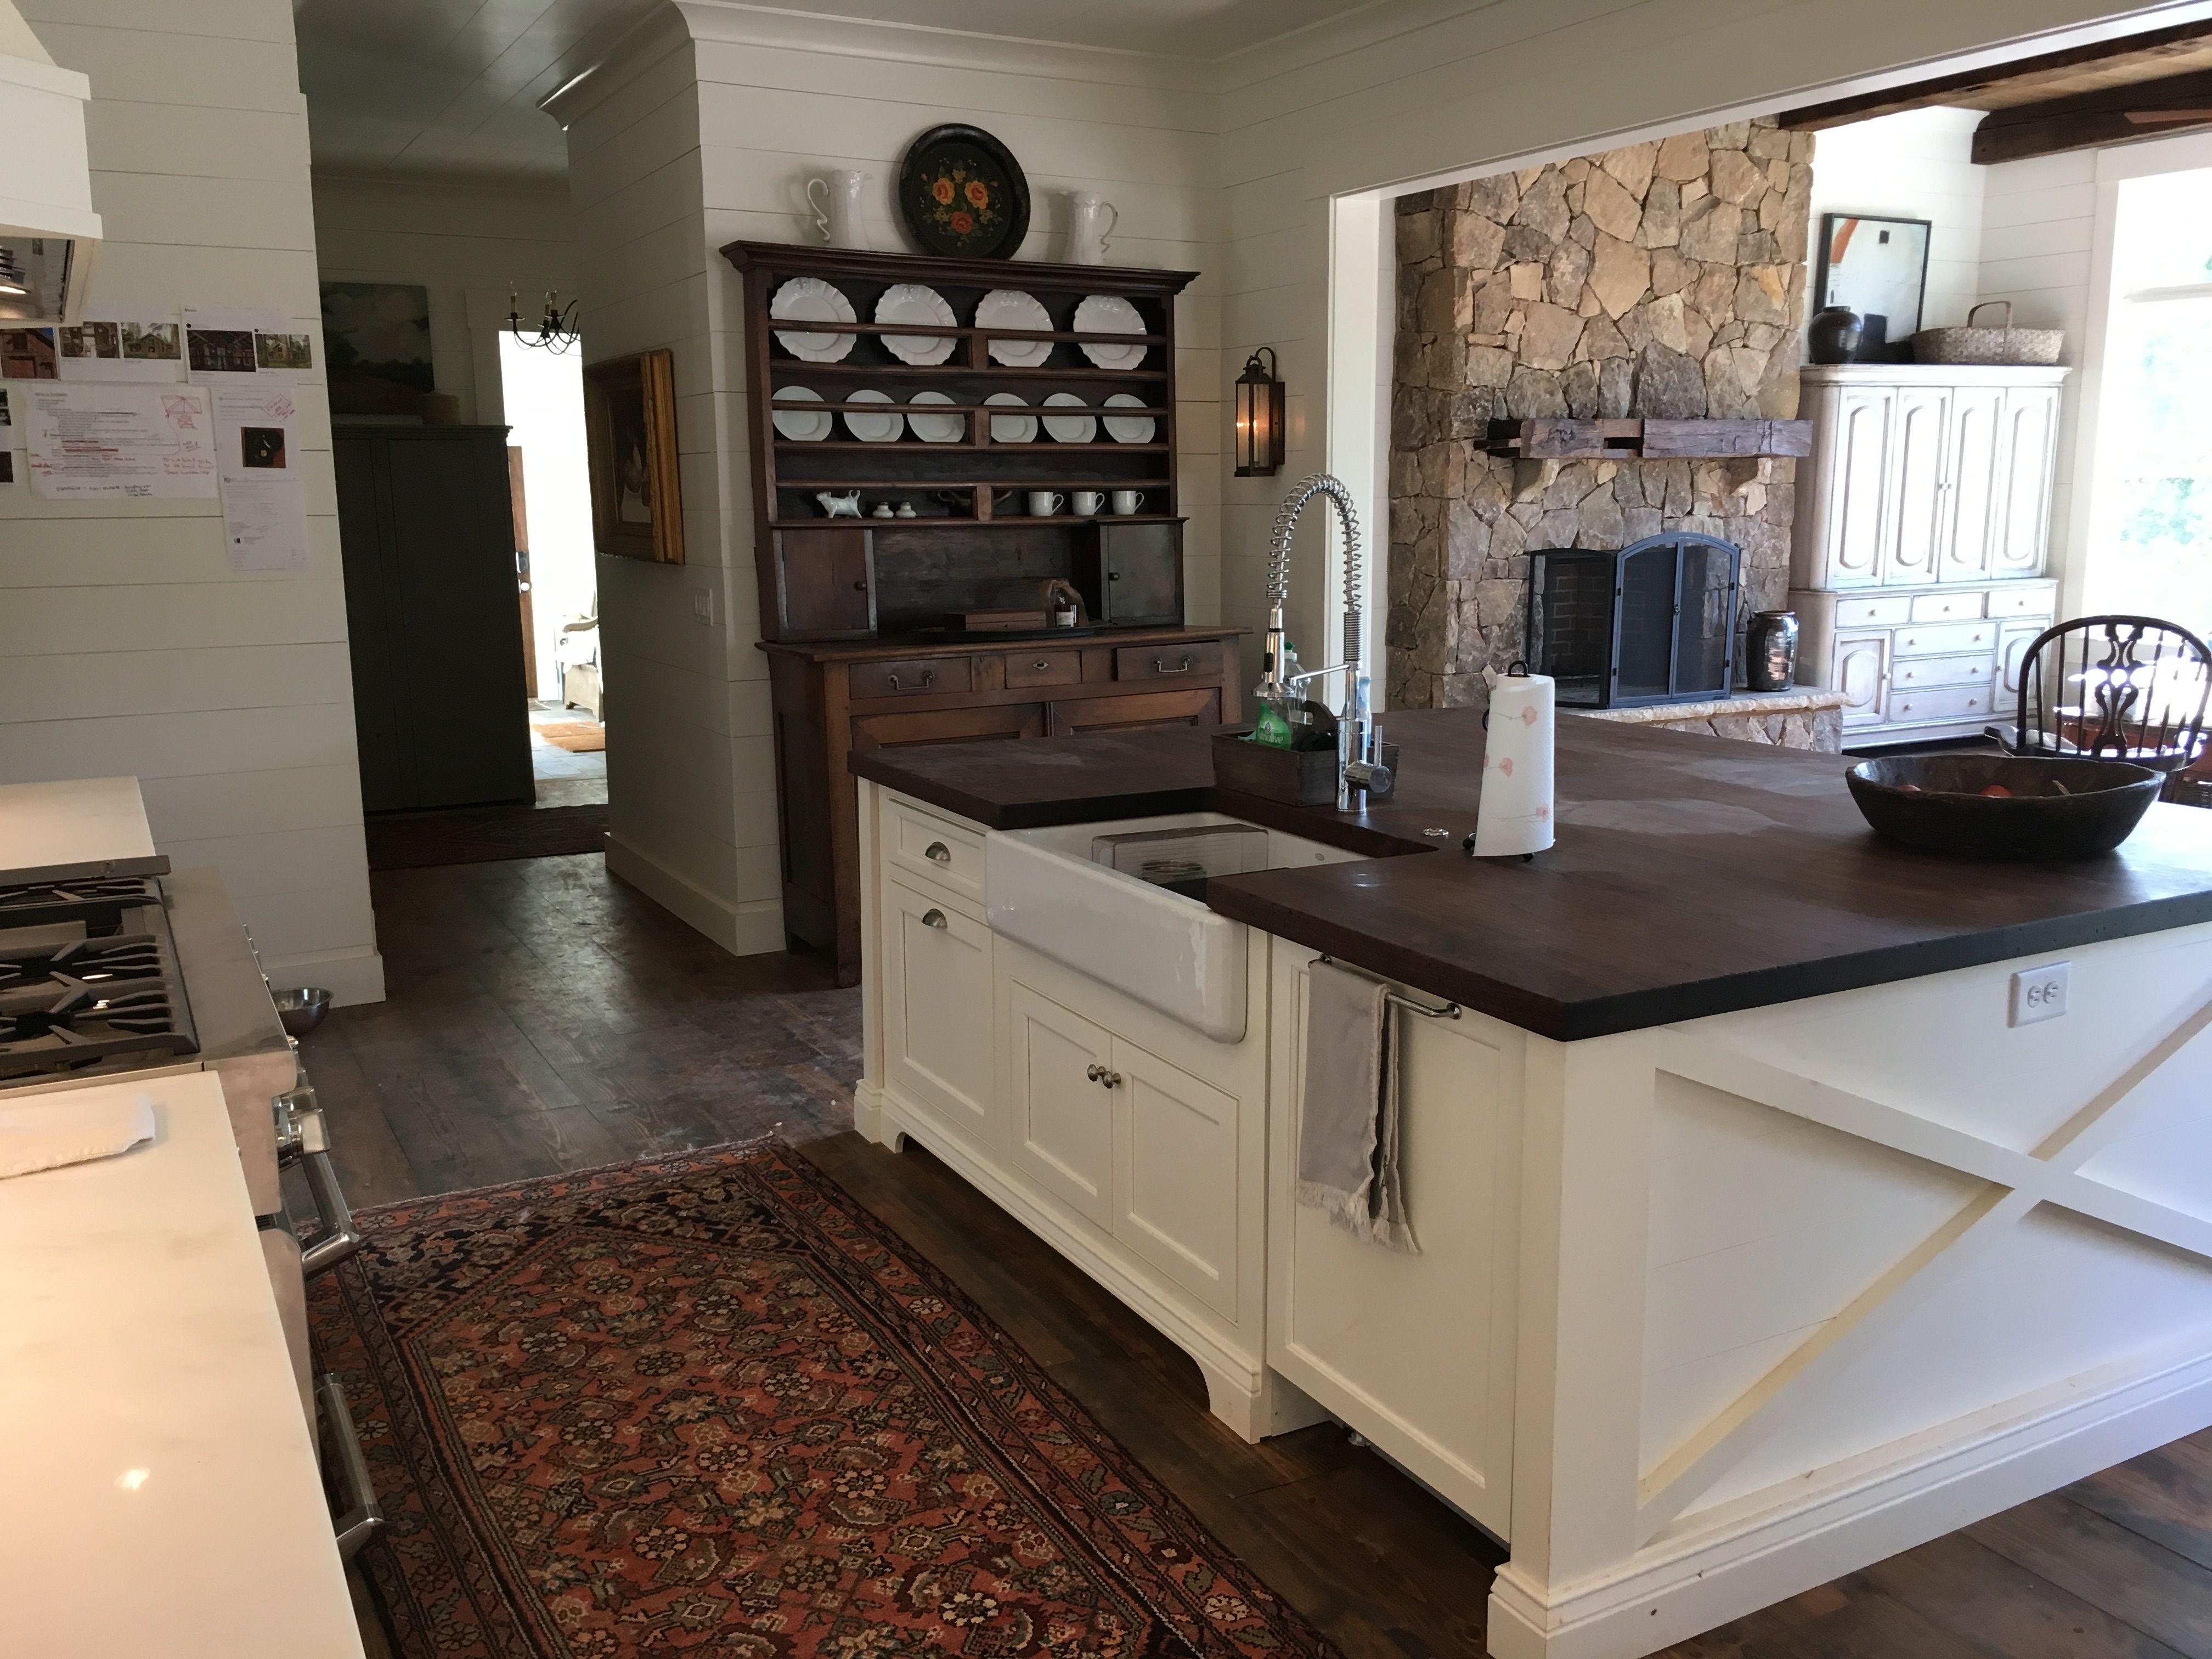 A New Farmhouse Kitchen In Sherwin Williams Dover White Farmhouse Kitchen Colors Tuscan Kitchen White Kitchen Cabinets